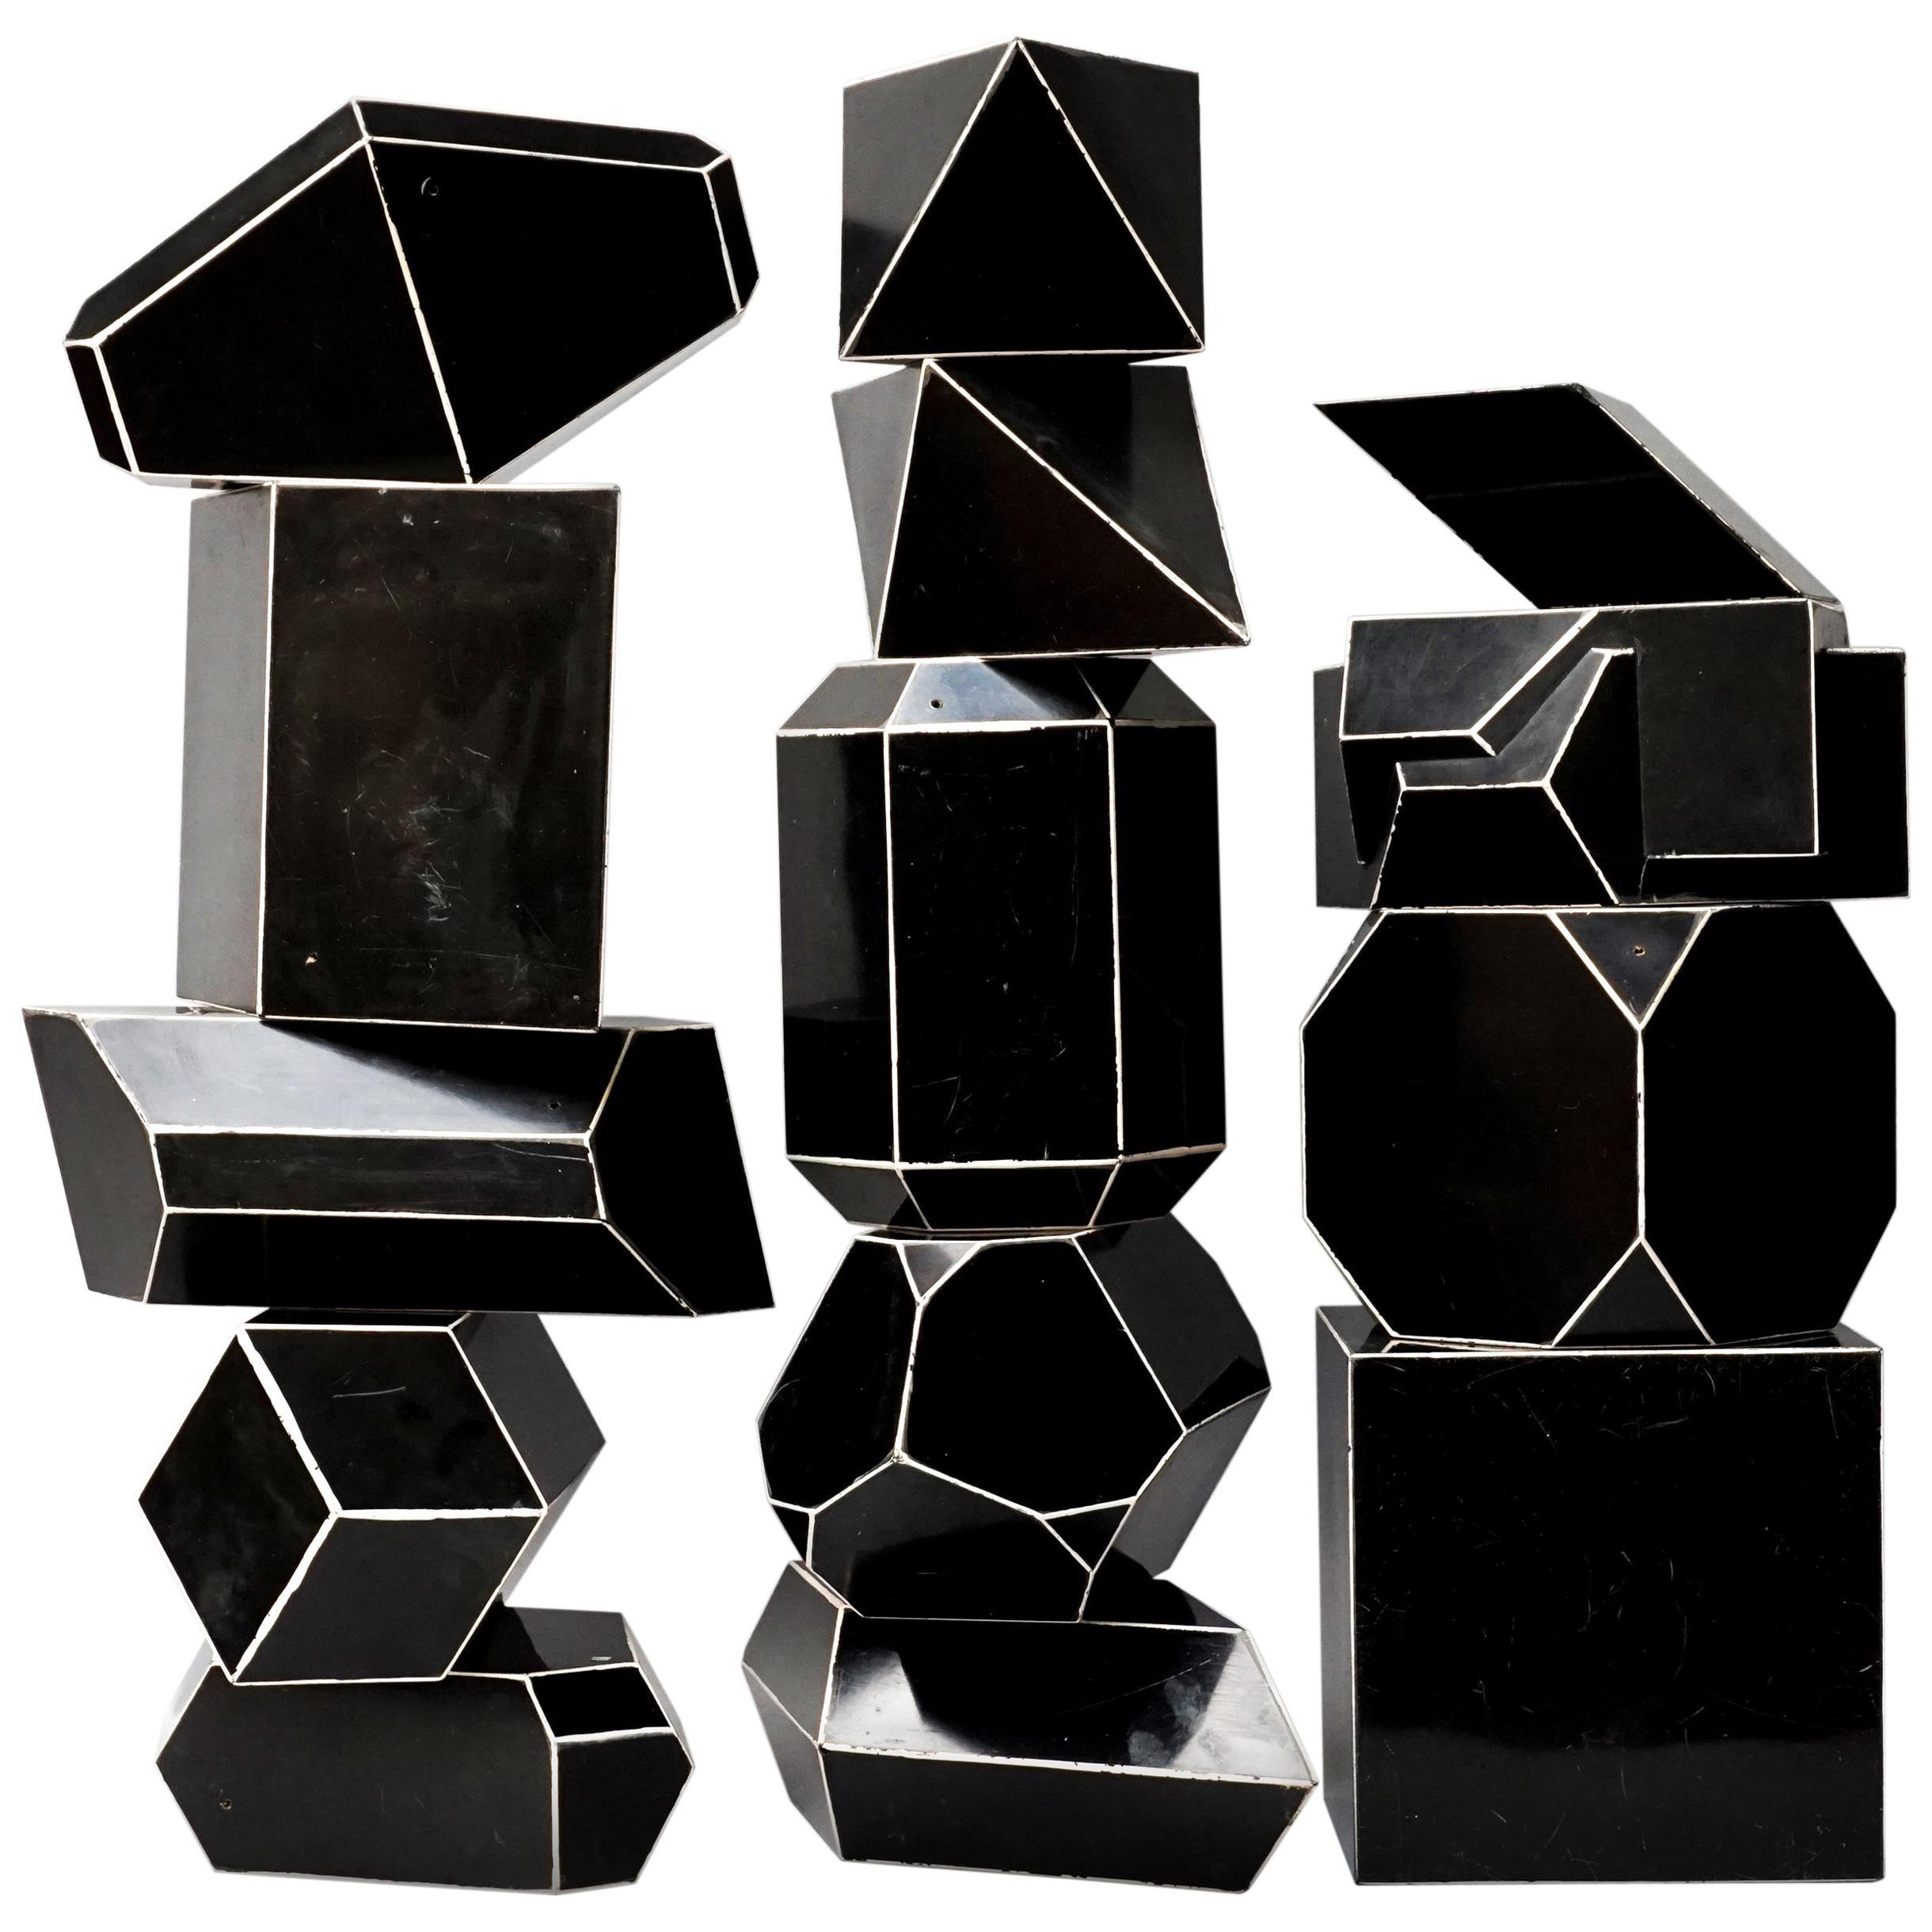 Set of Fourteen Geometric Bakelite Art Deco Science Classroom Crystal Models